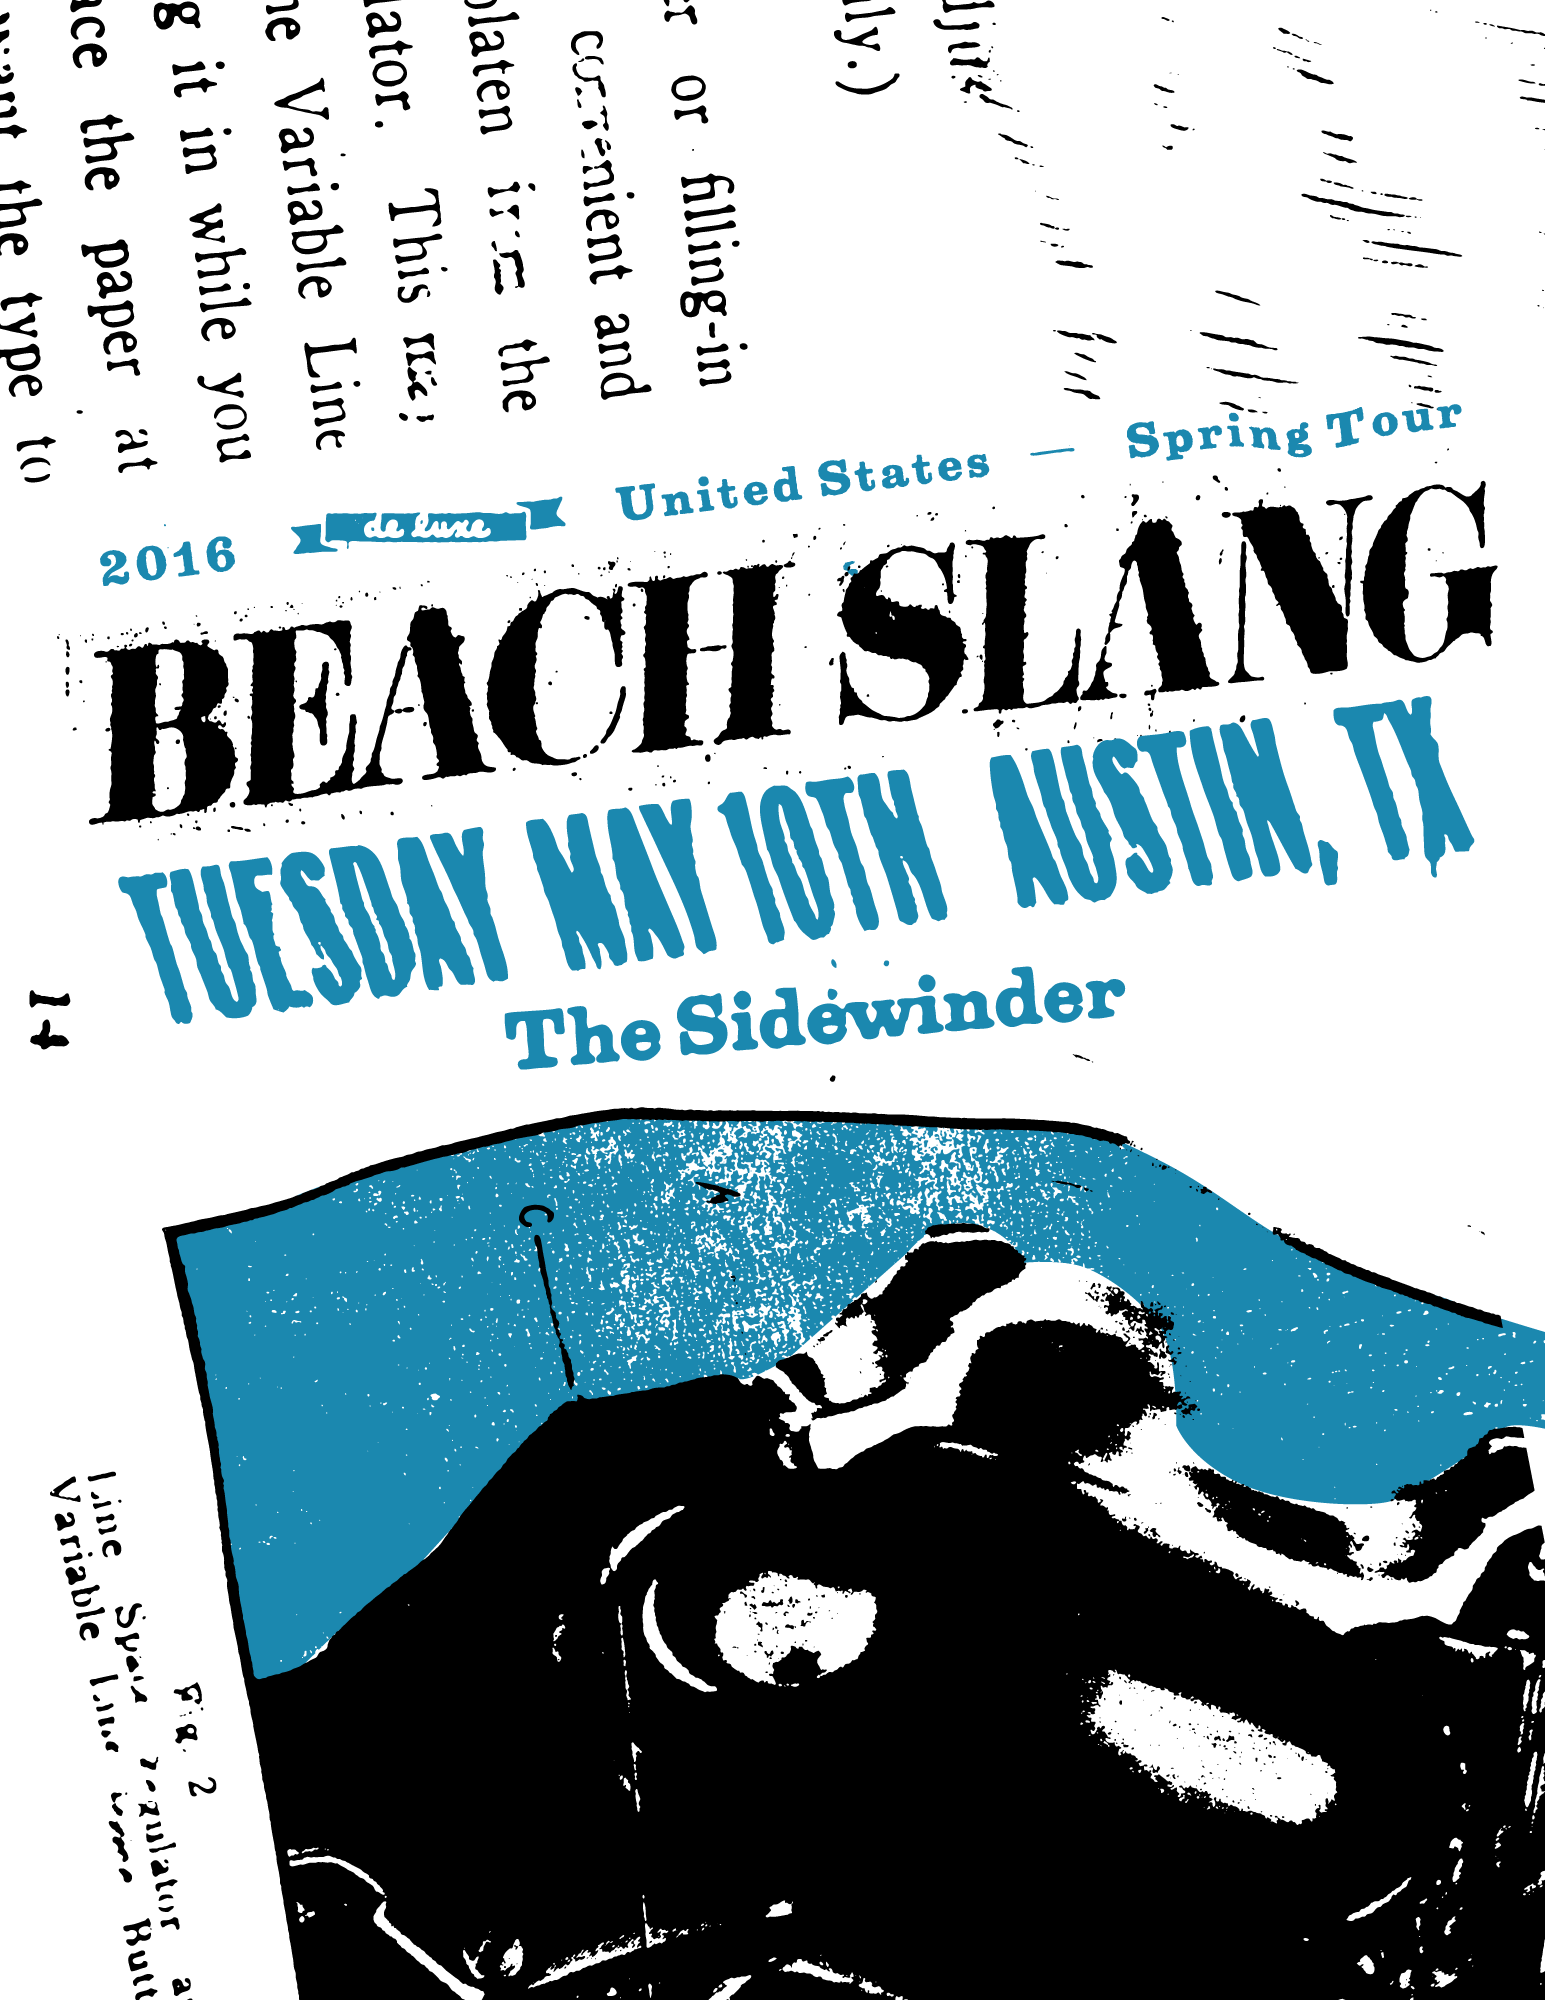 BeachSlang_5-10_Austin_r1.png